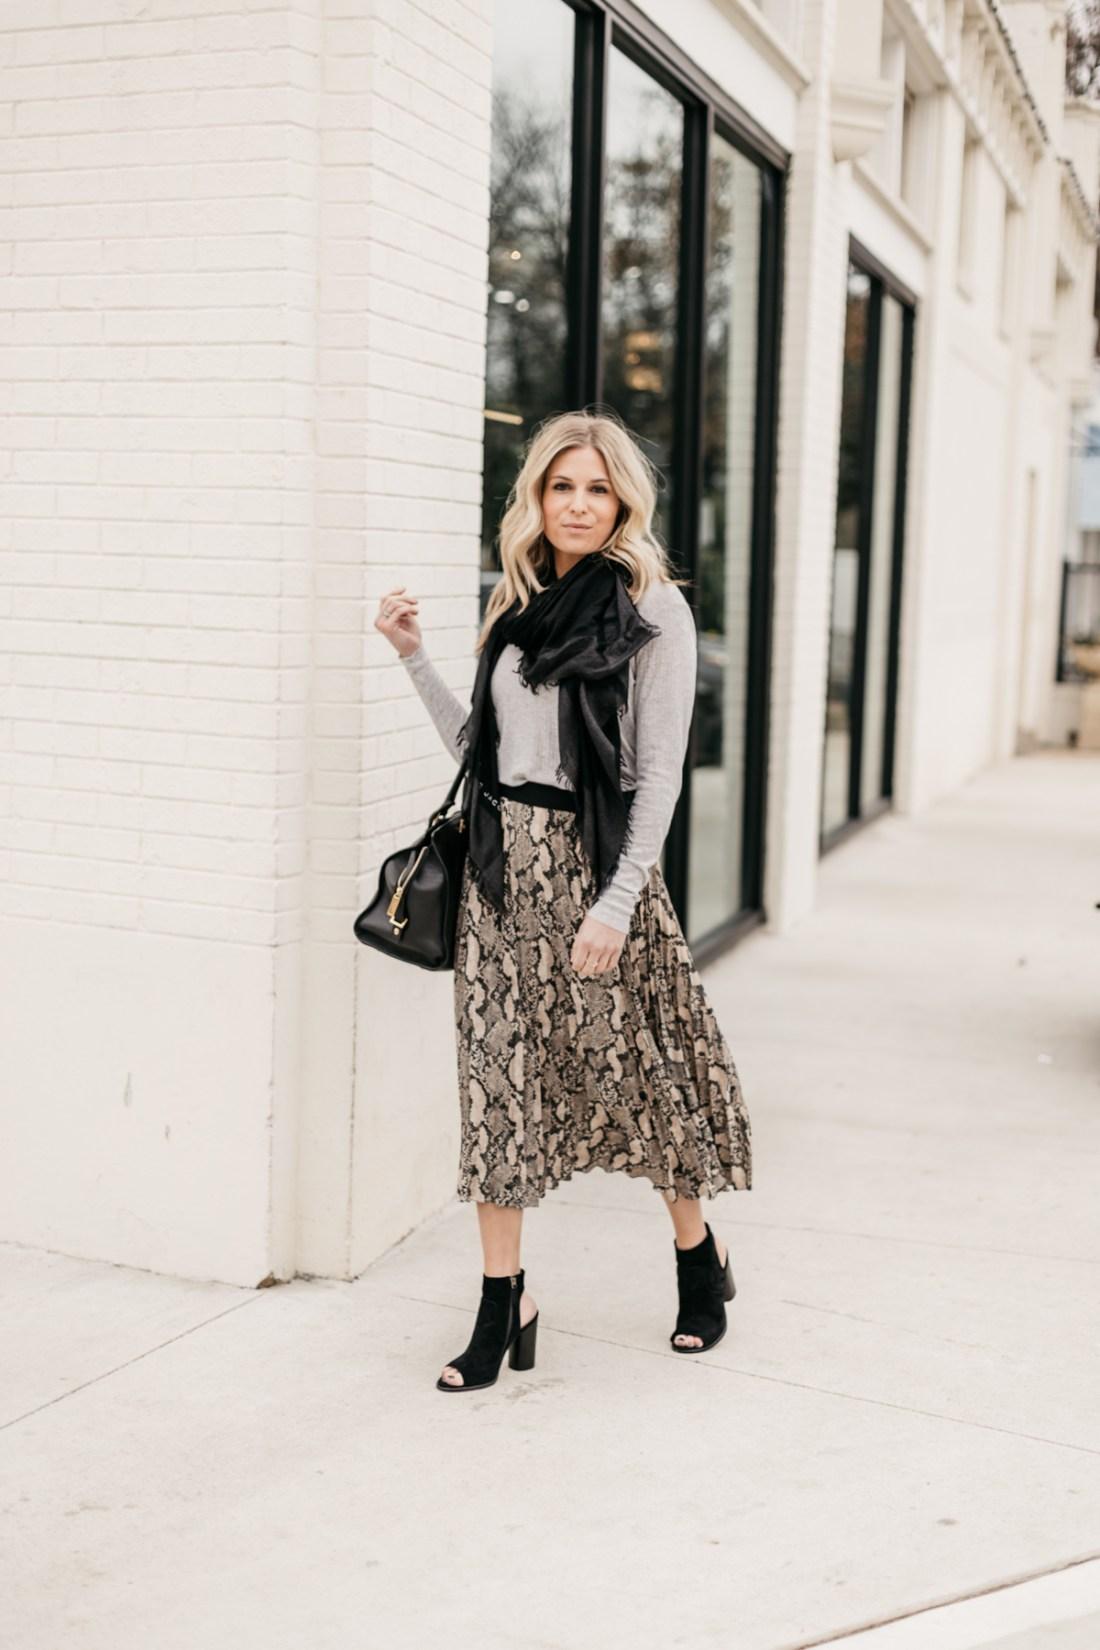 Leopard Skirt // Long Sleeve Top // Open Toed Booties // Black Fringe Scarf